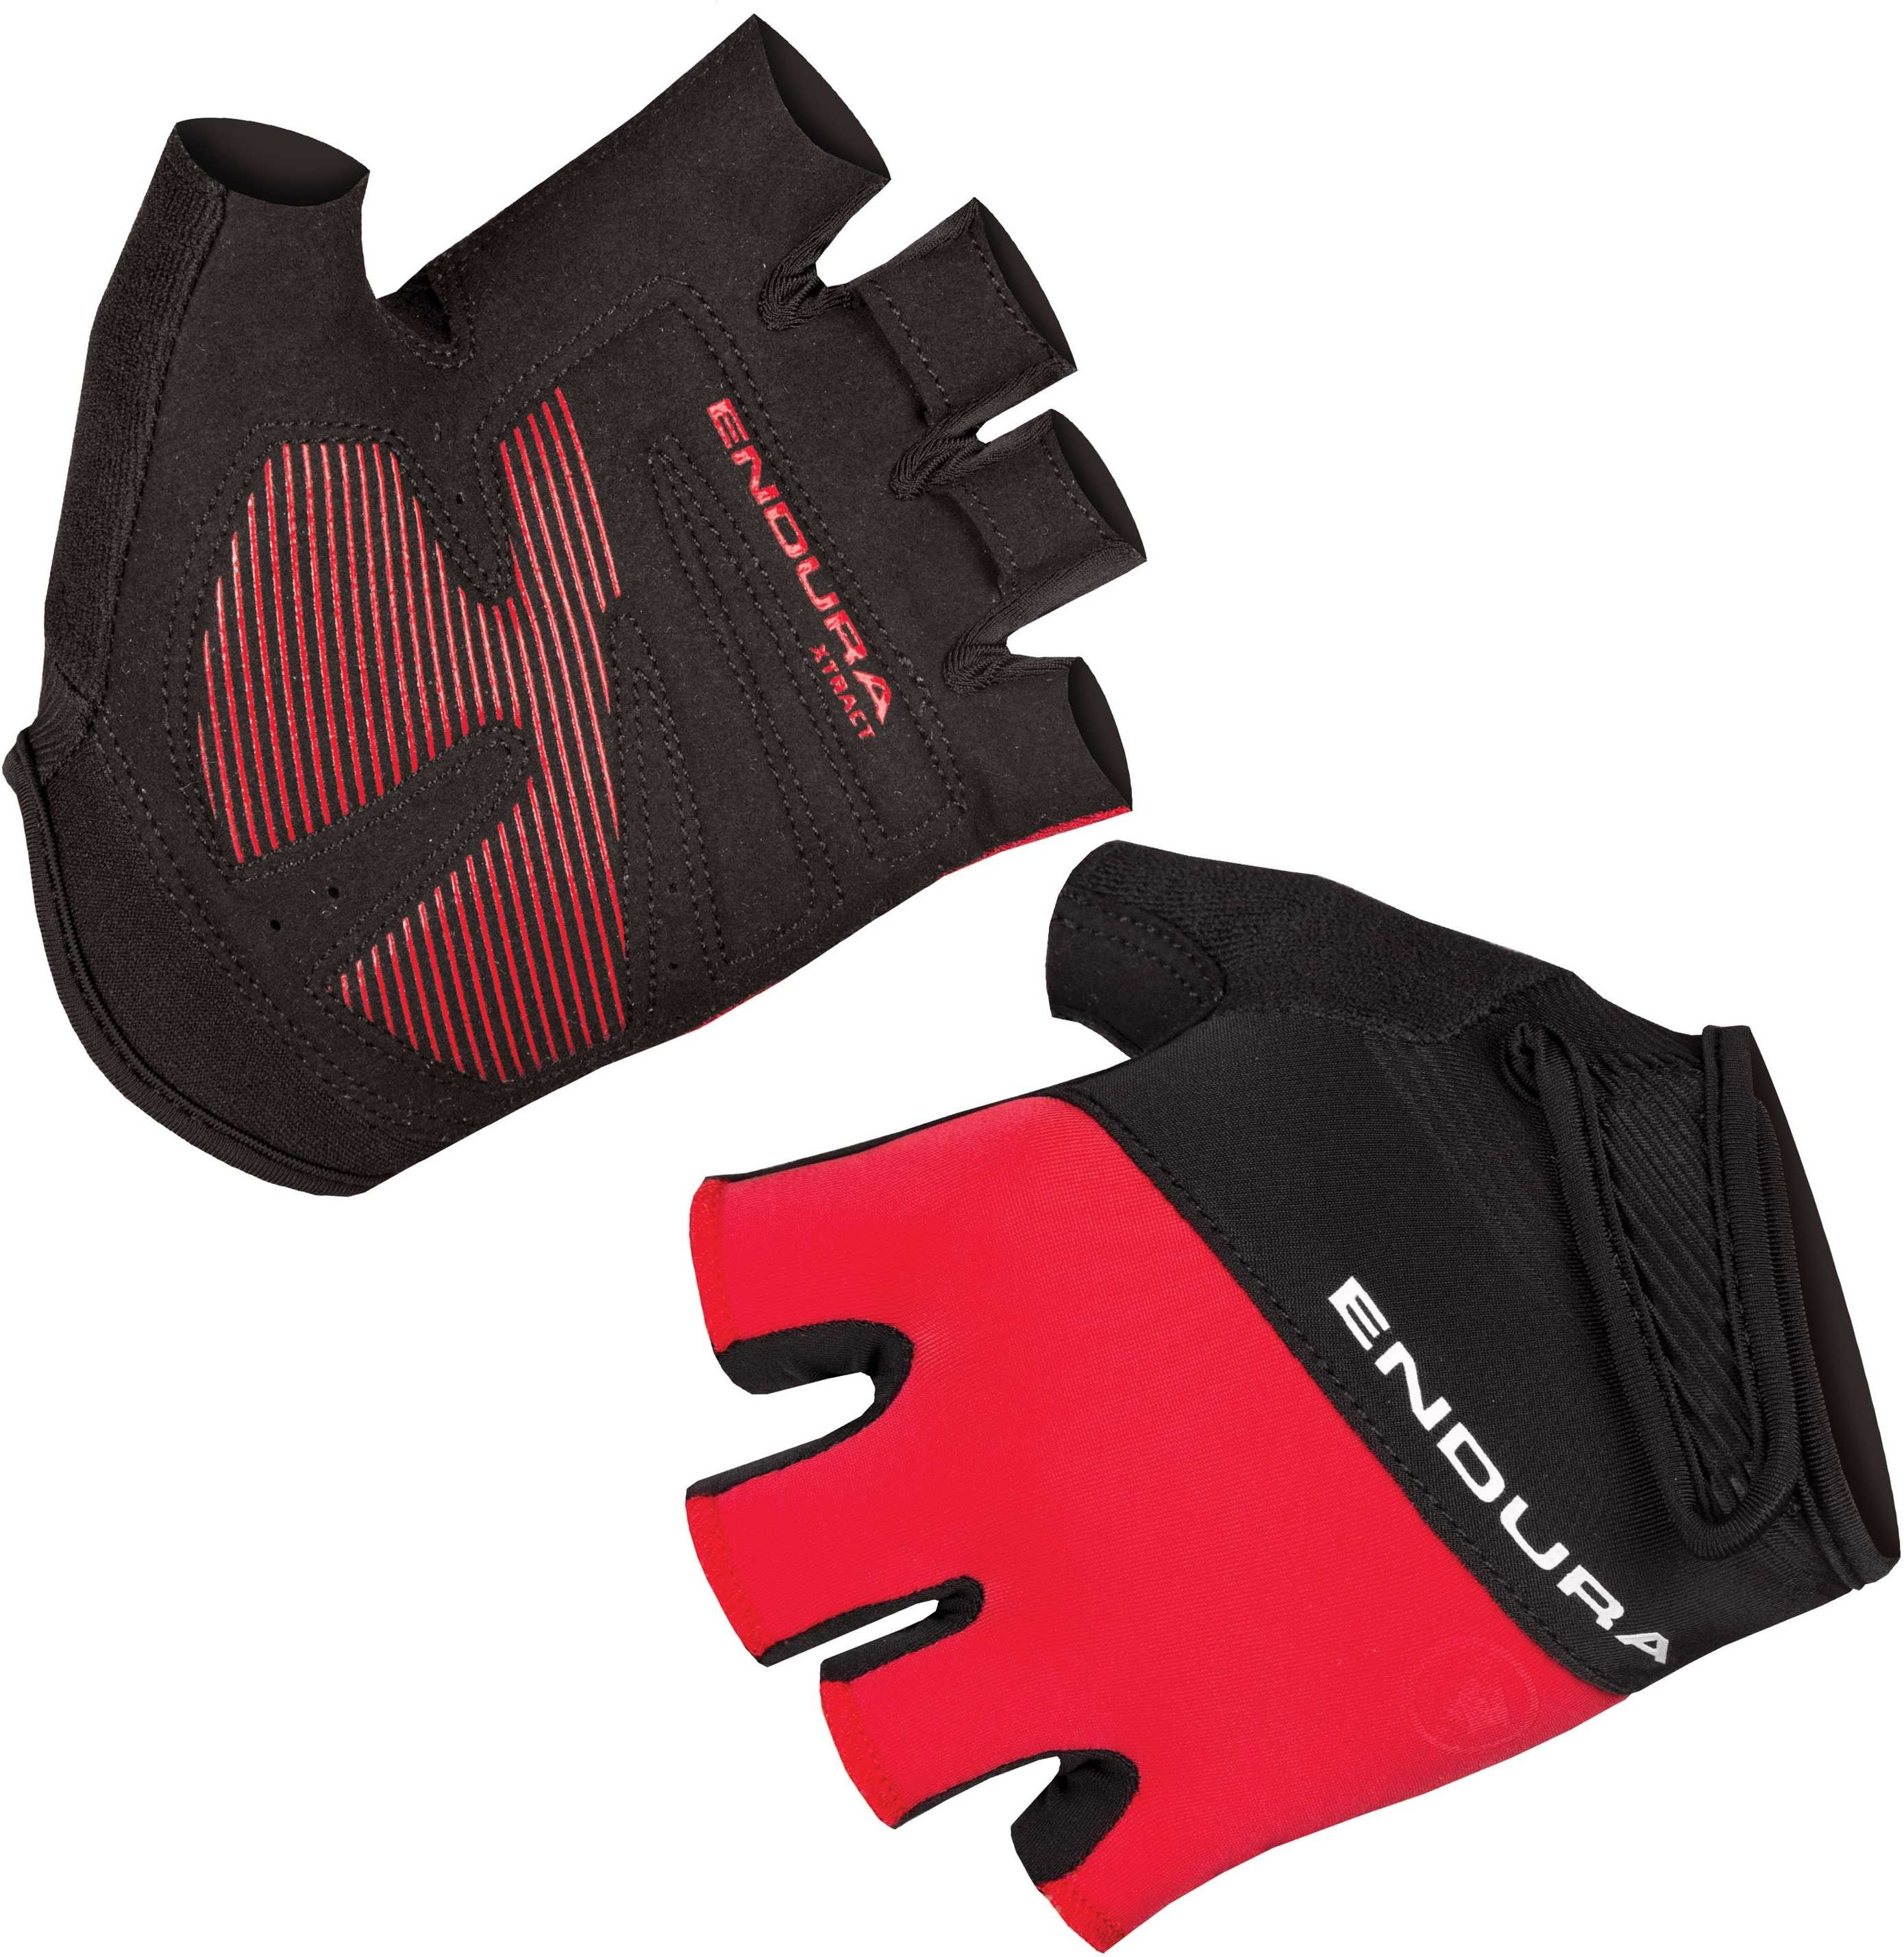 Handsker Endura Xtract II rød | Gloves